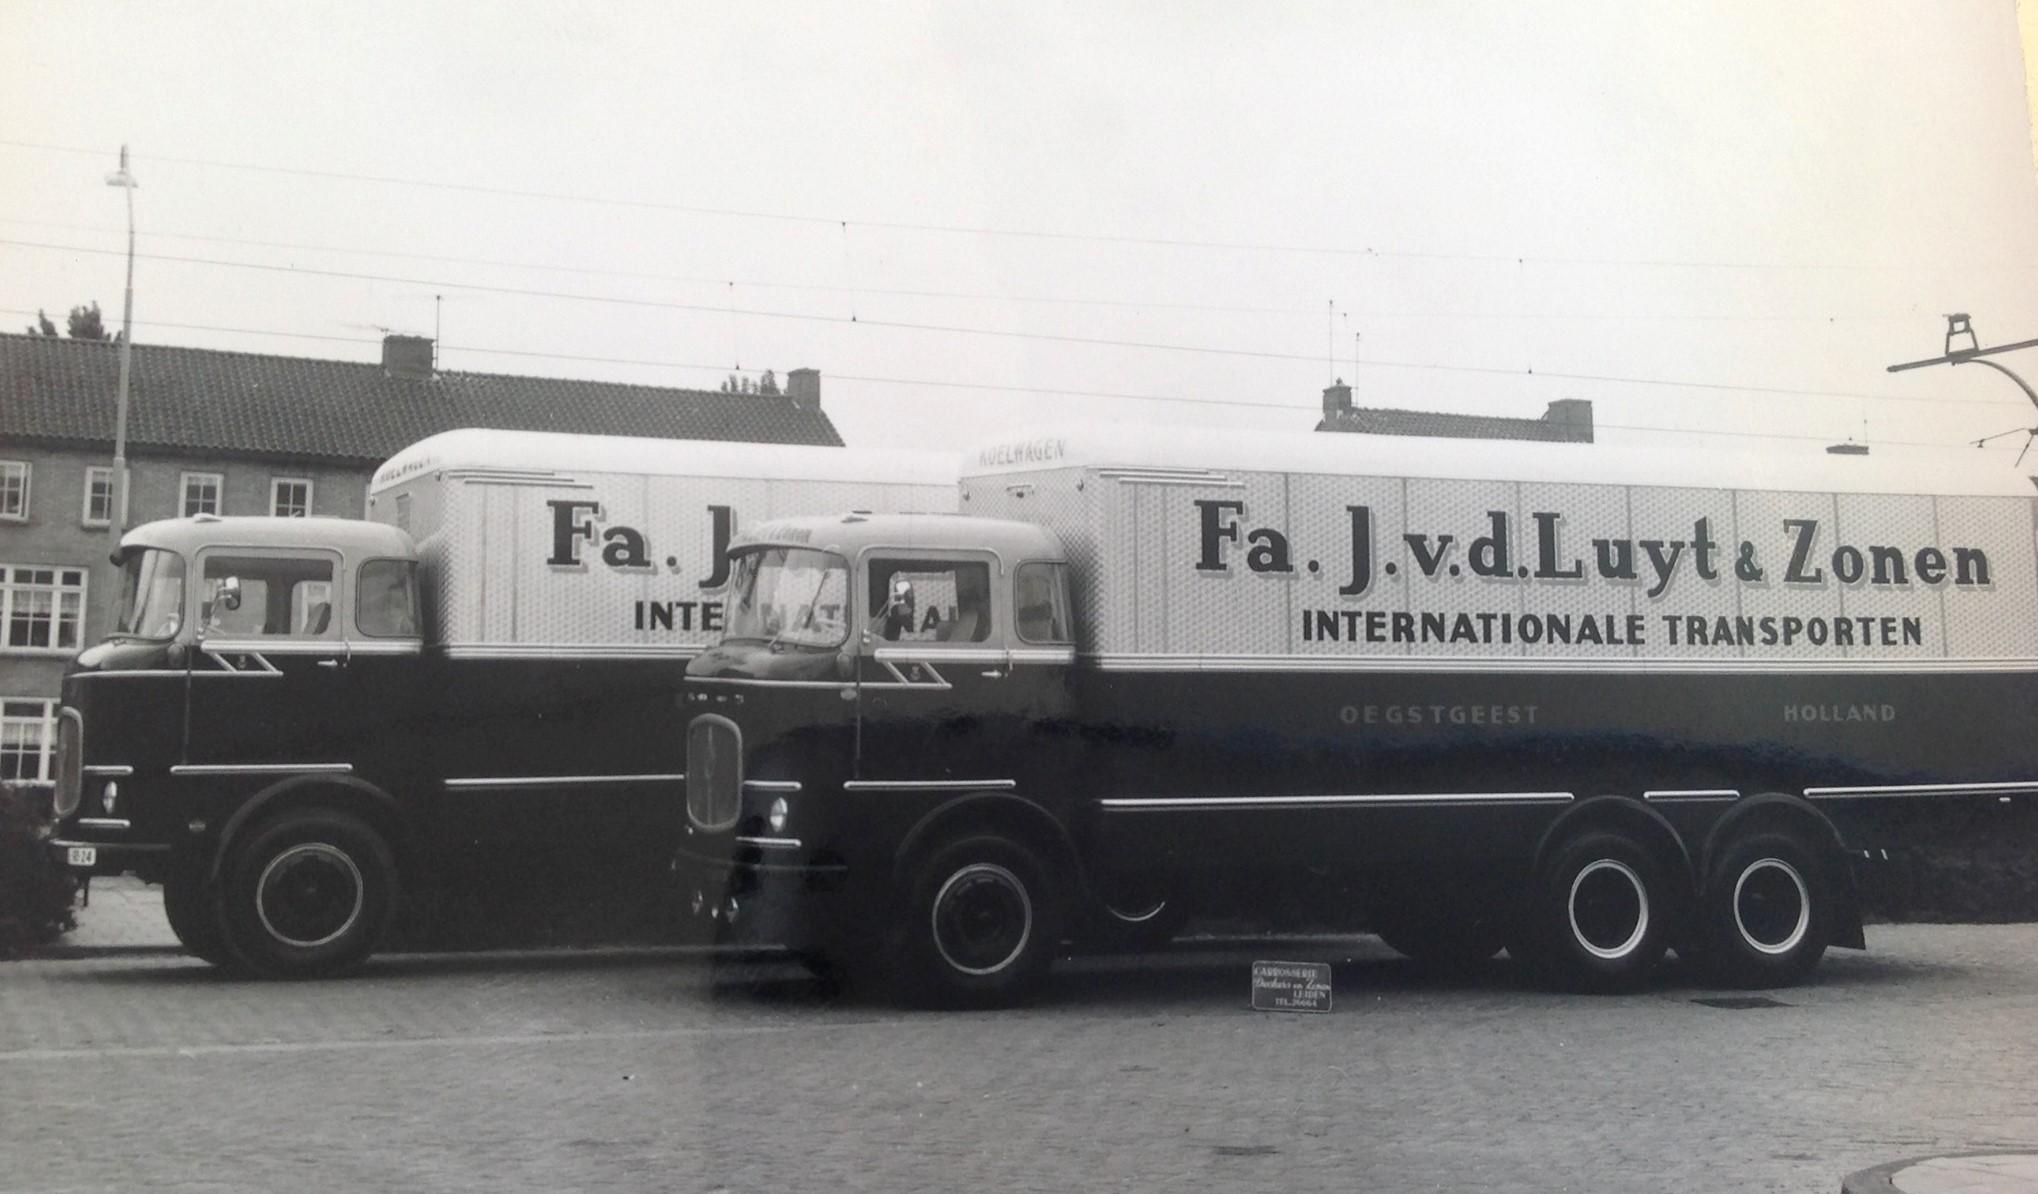 Scania-LV--Carr-cabine-v-Eck-en-de-bak-Deckers-Leiden-2